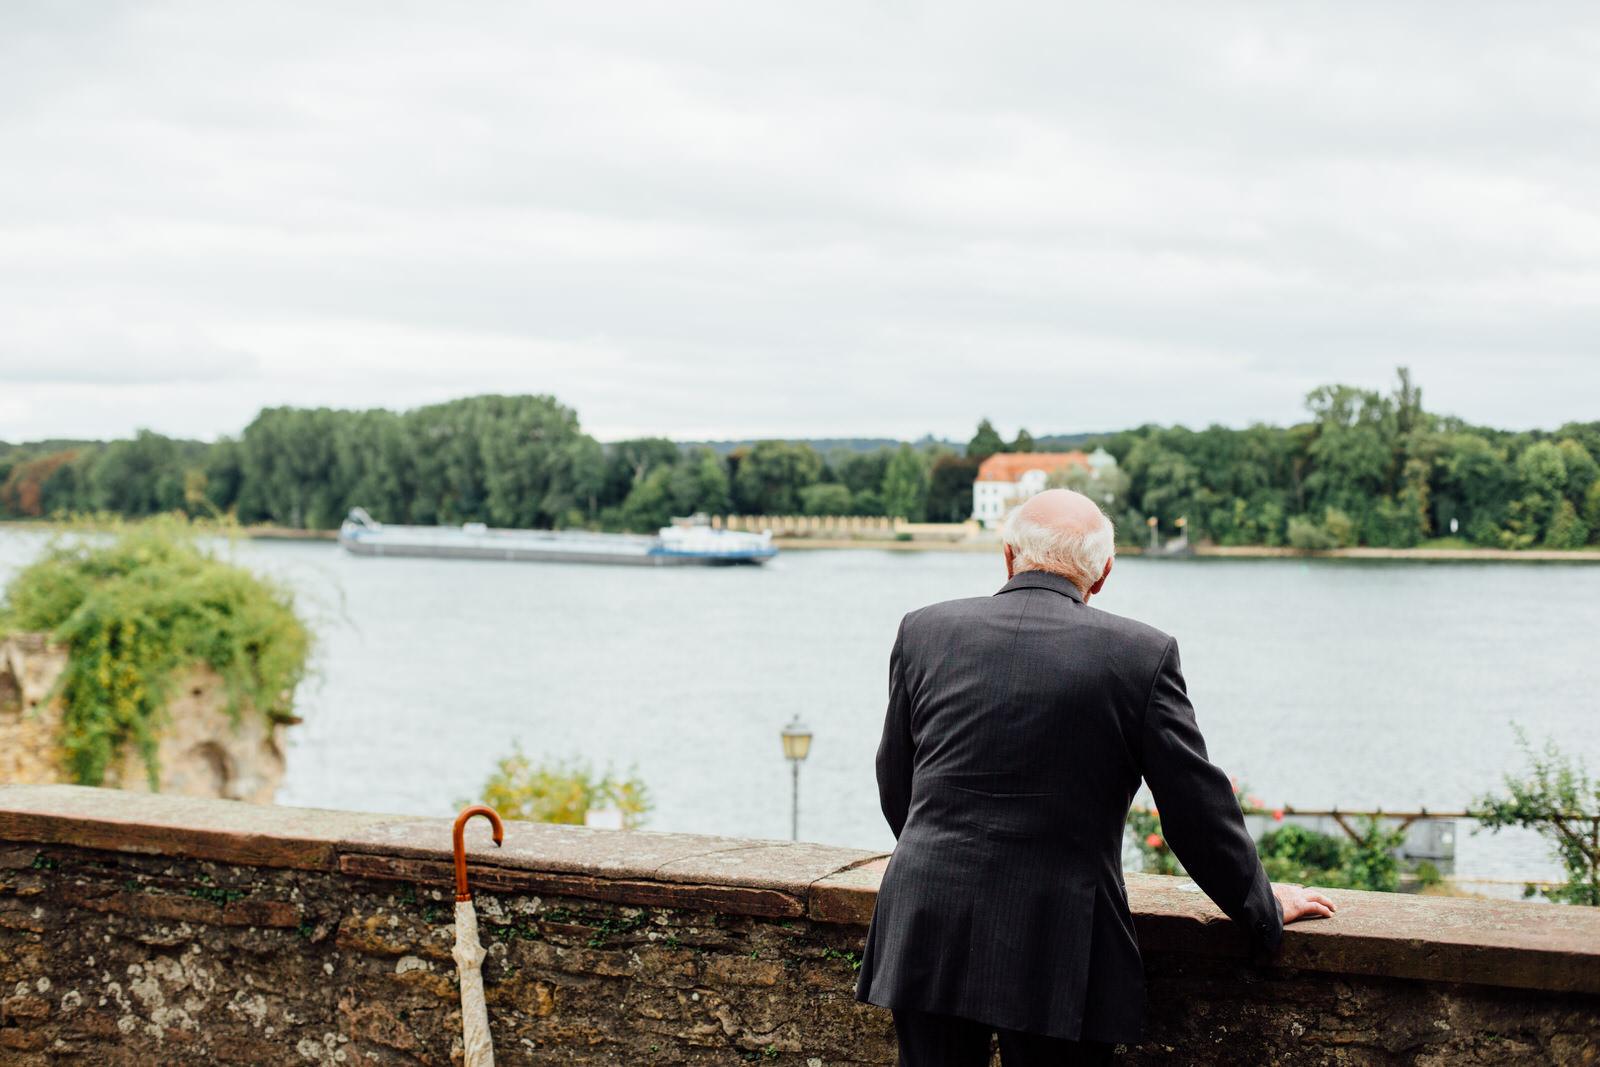 Paul_Traeger_Hochzeitsfotograf_Thueringen_Erfurt_Jena_Weimar_100221246.JPG